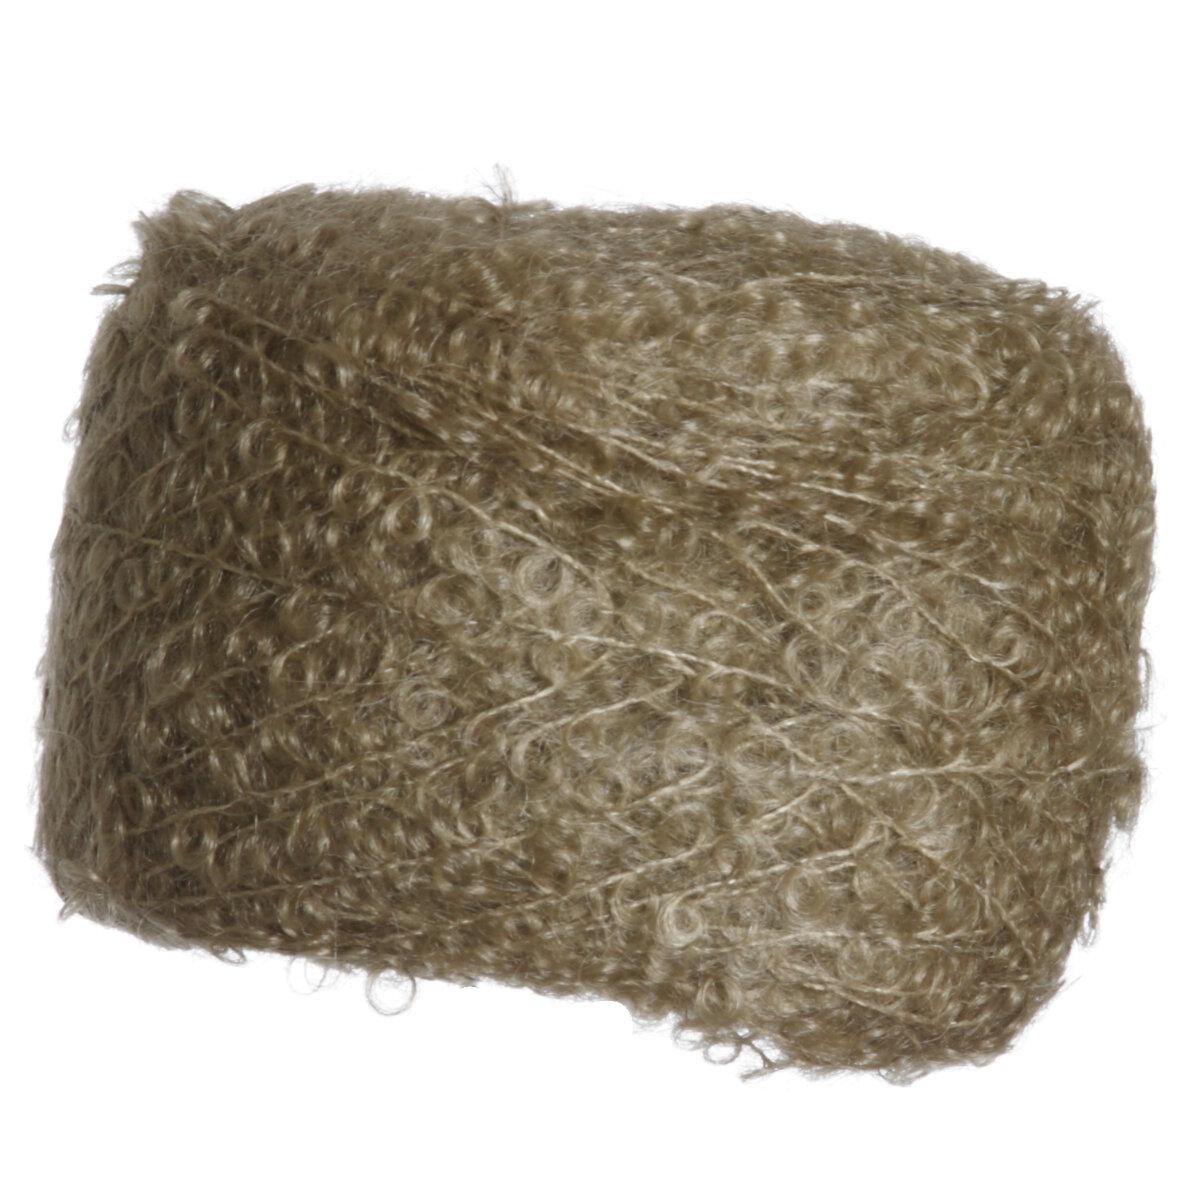 Knitting Patterns Boucle Wool : Be Sweet Medium Boucle Yarn - Dark Camel at Jimmy Beans Wool